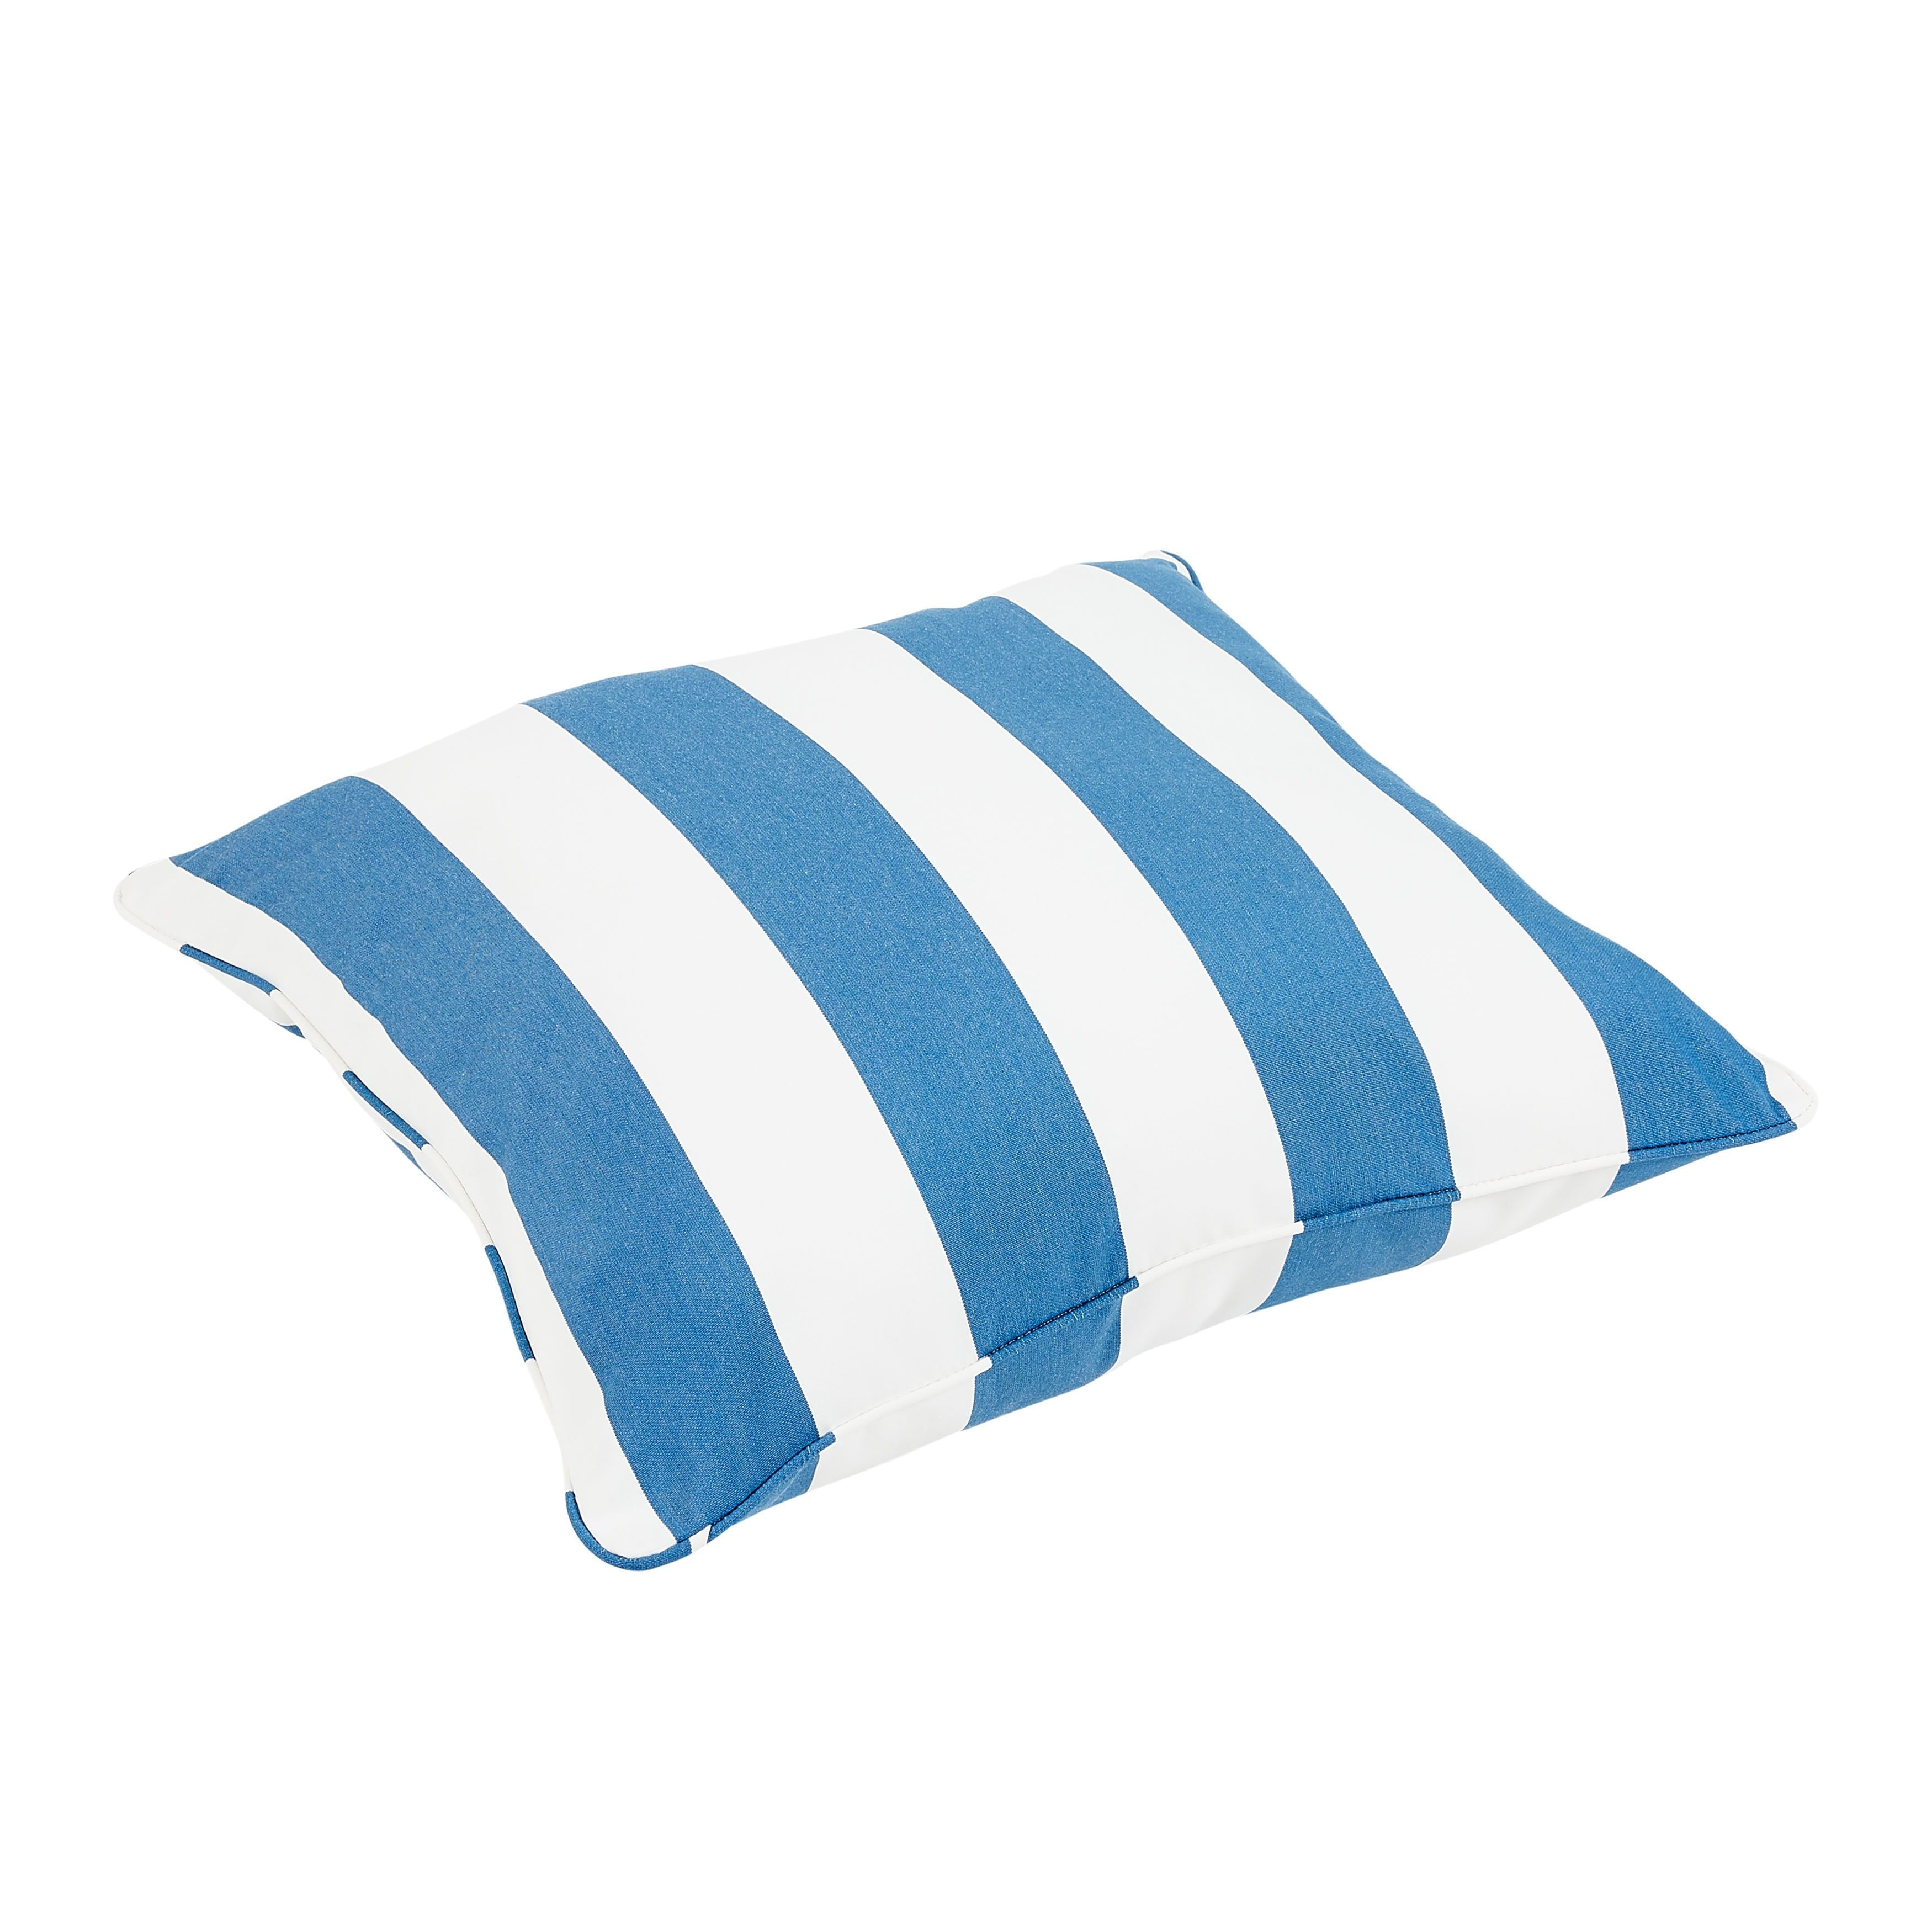 Duvall Sunbrella Cabana Regatta Indoor Outdoor 26 Inch Floor Corded Pillow Osps6287 Blue Acrylic Striped Cushion